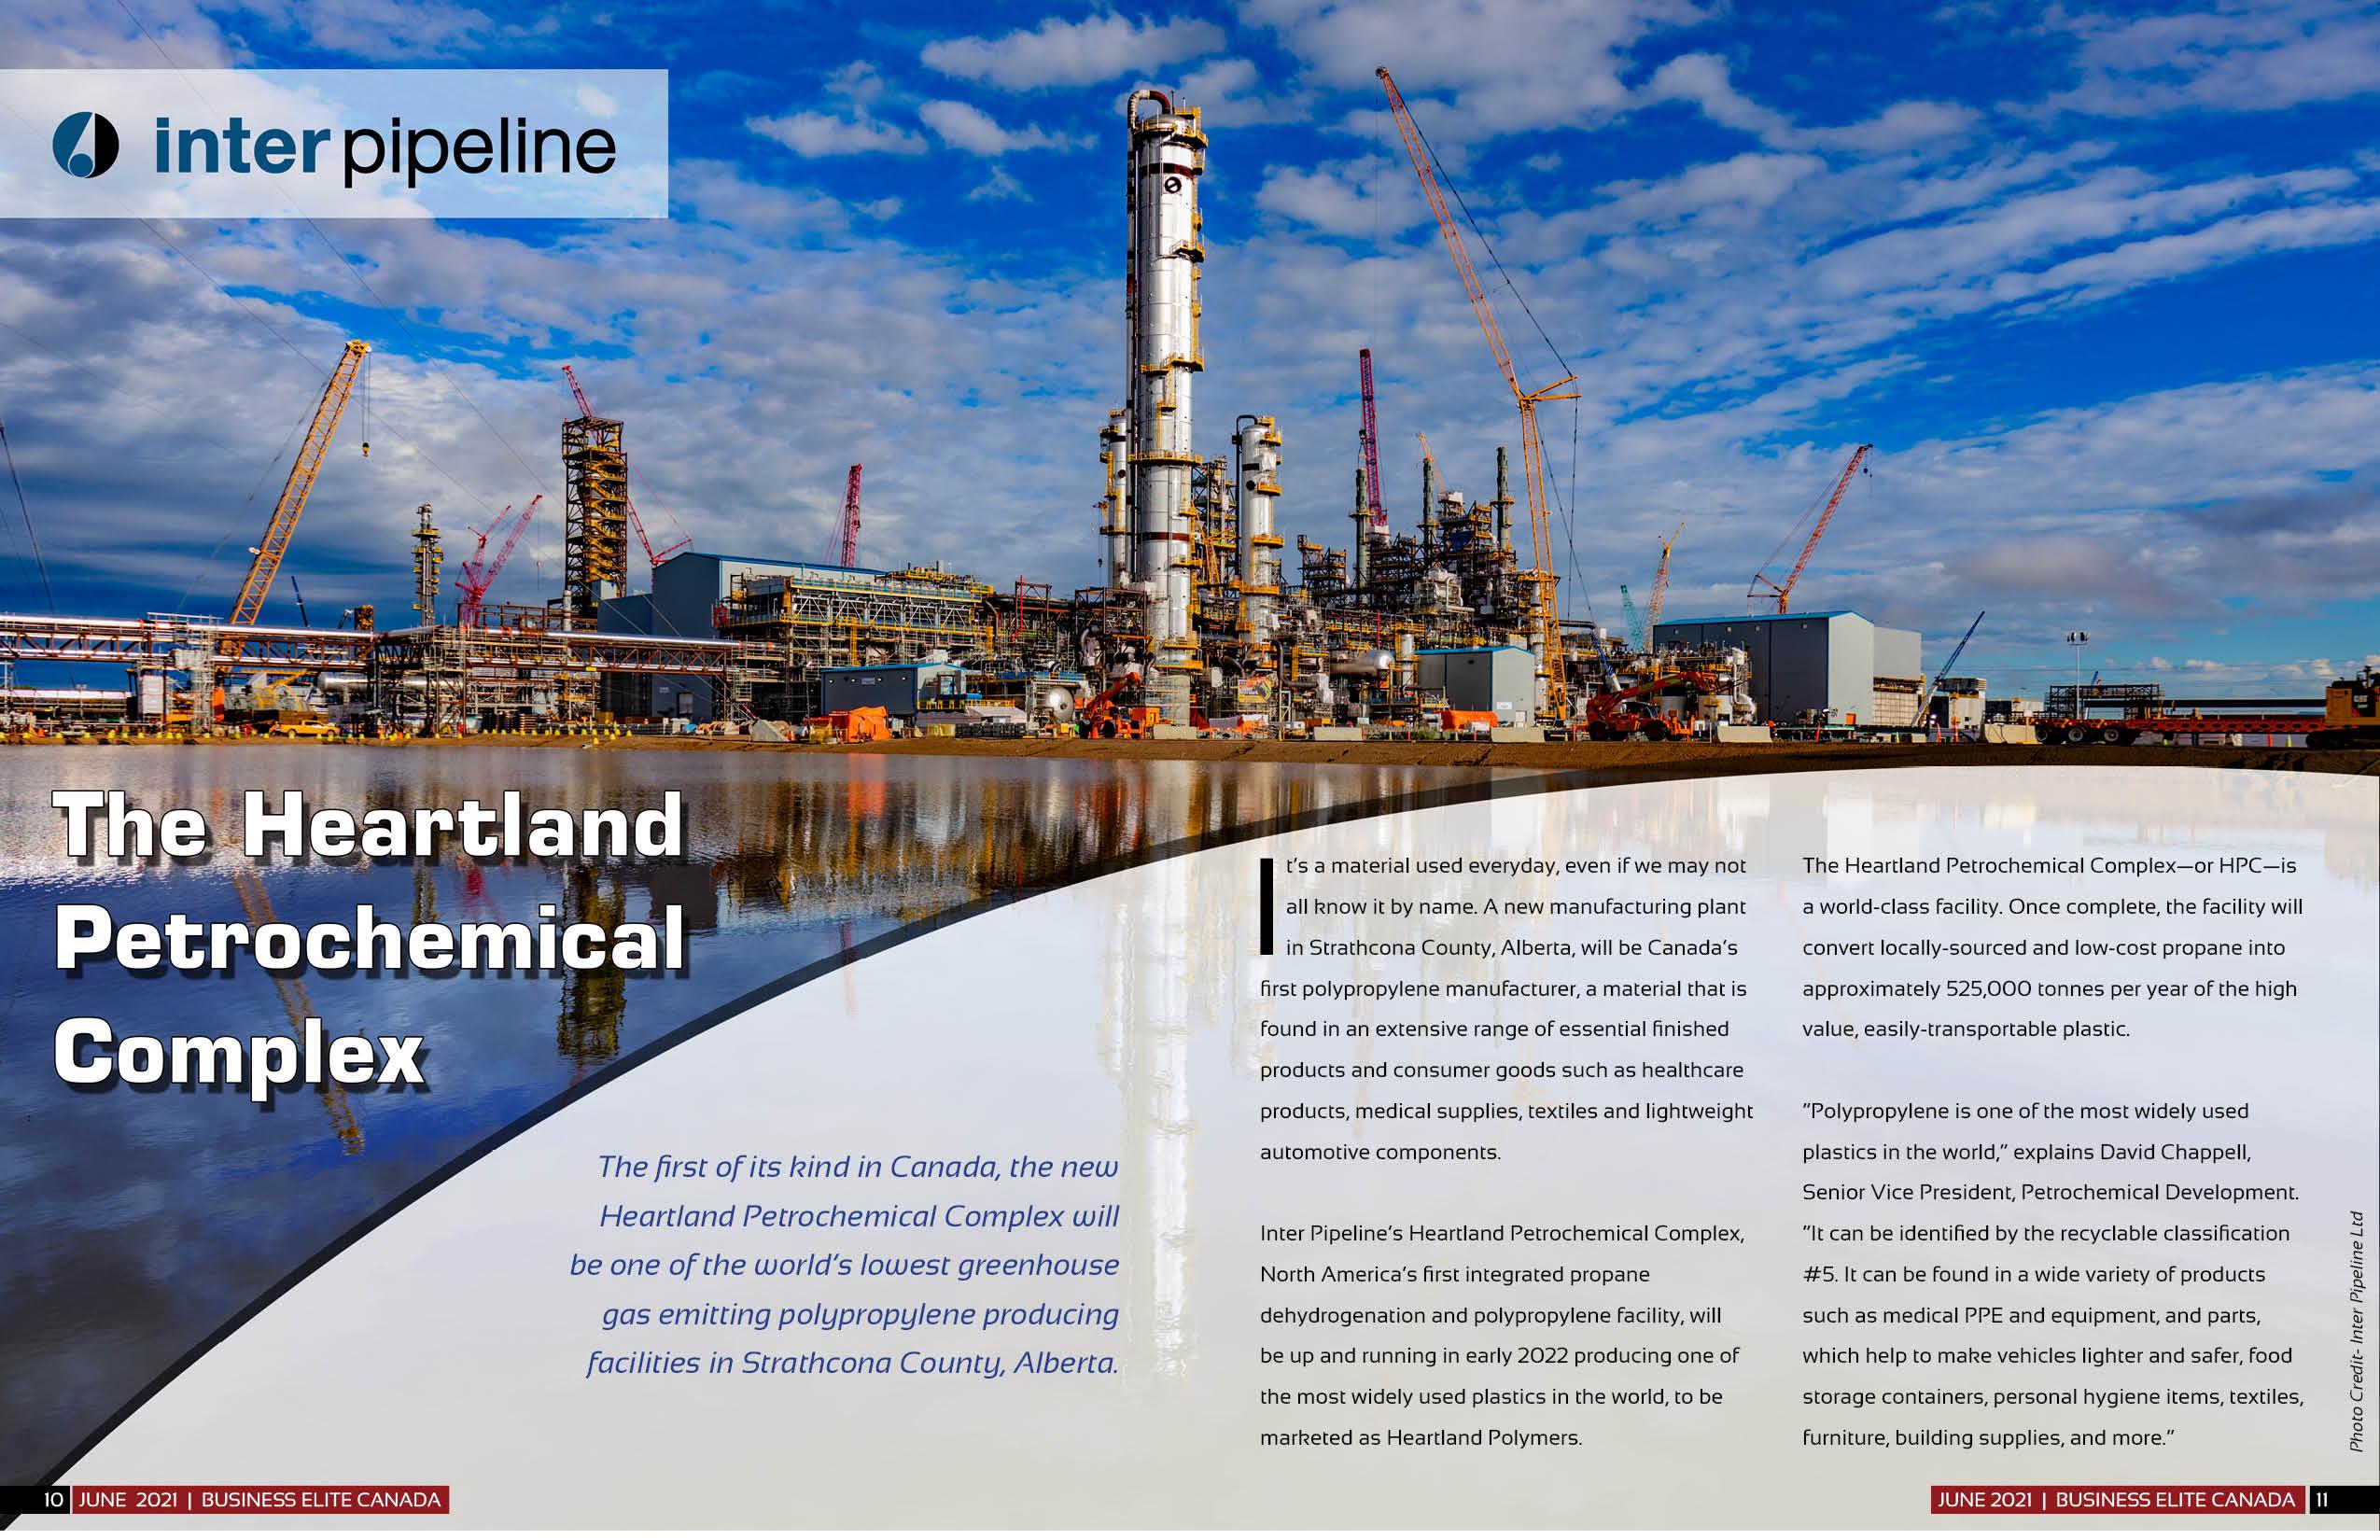 Inter Pipeline Heartland Petrochemical Complex